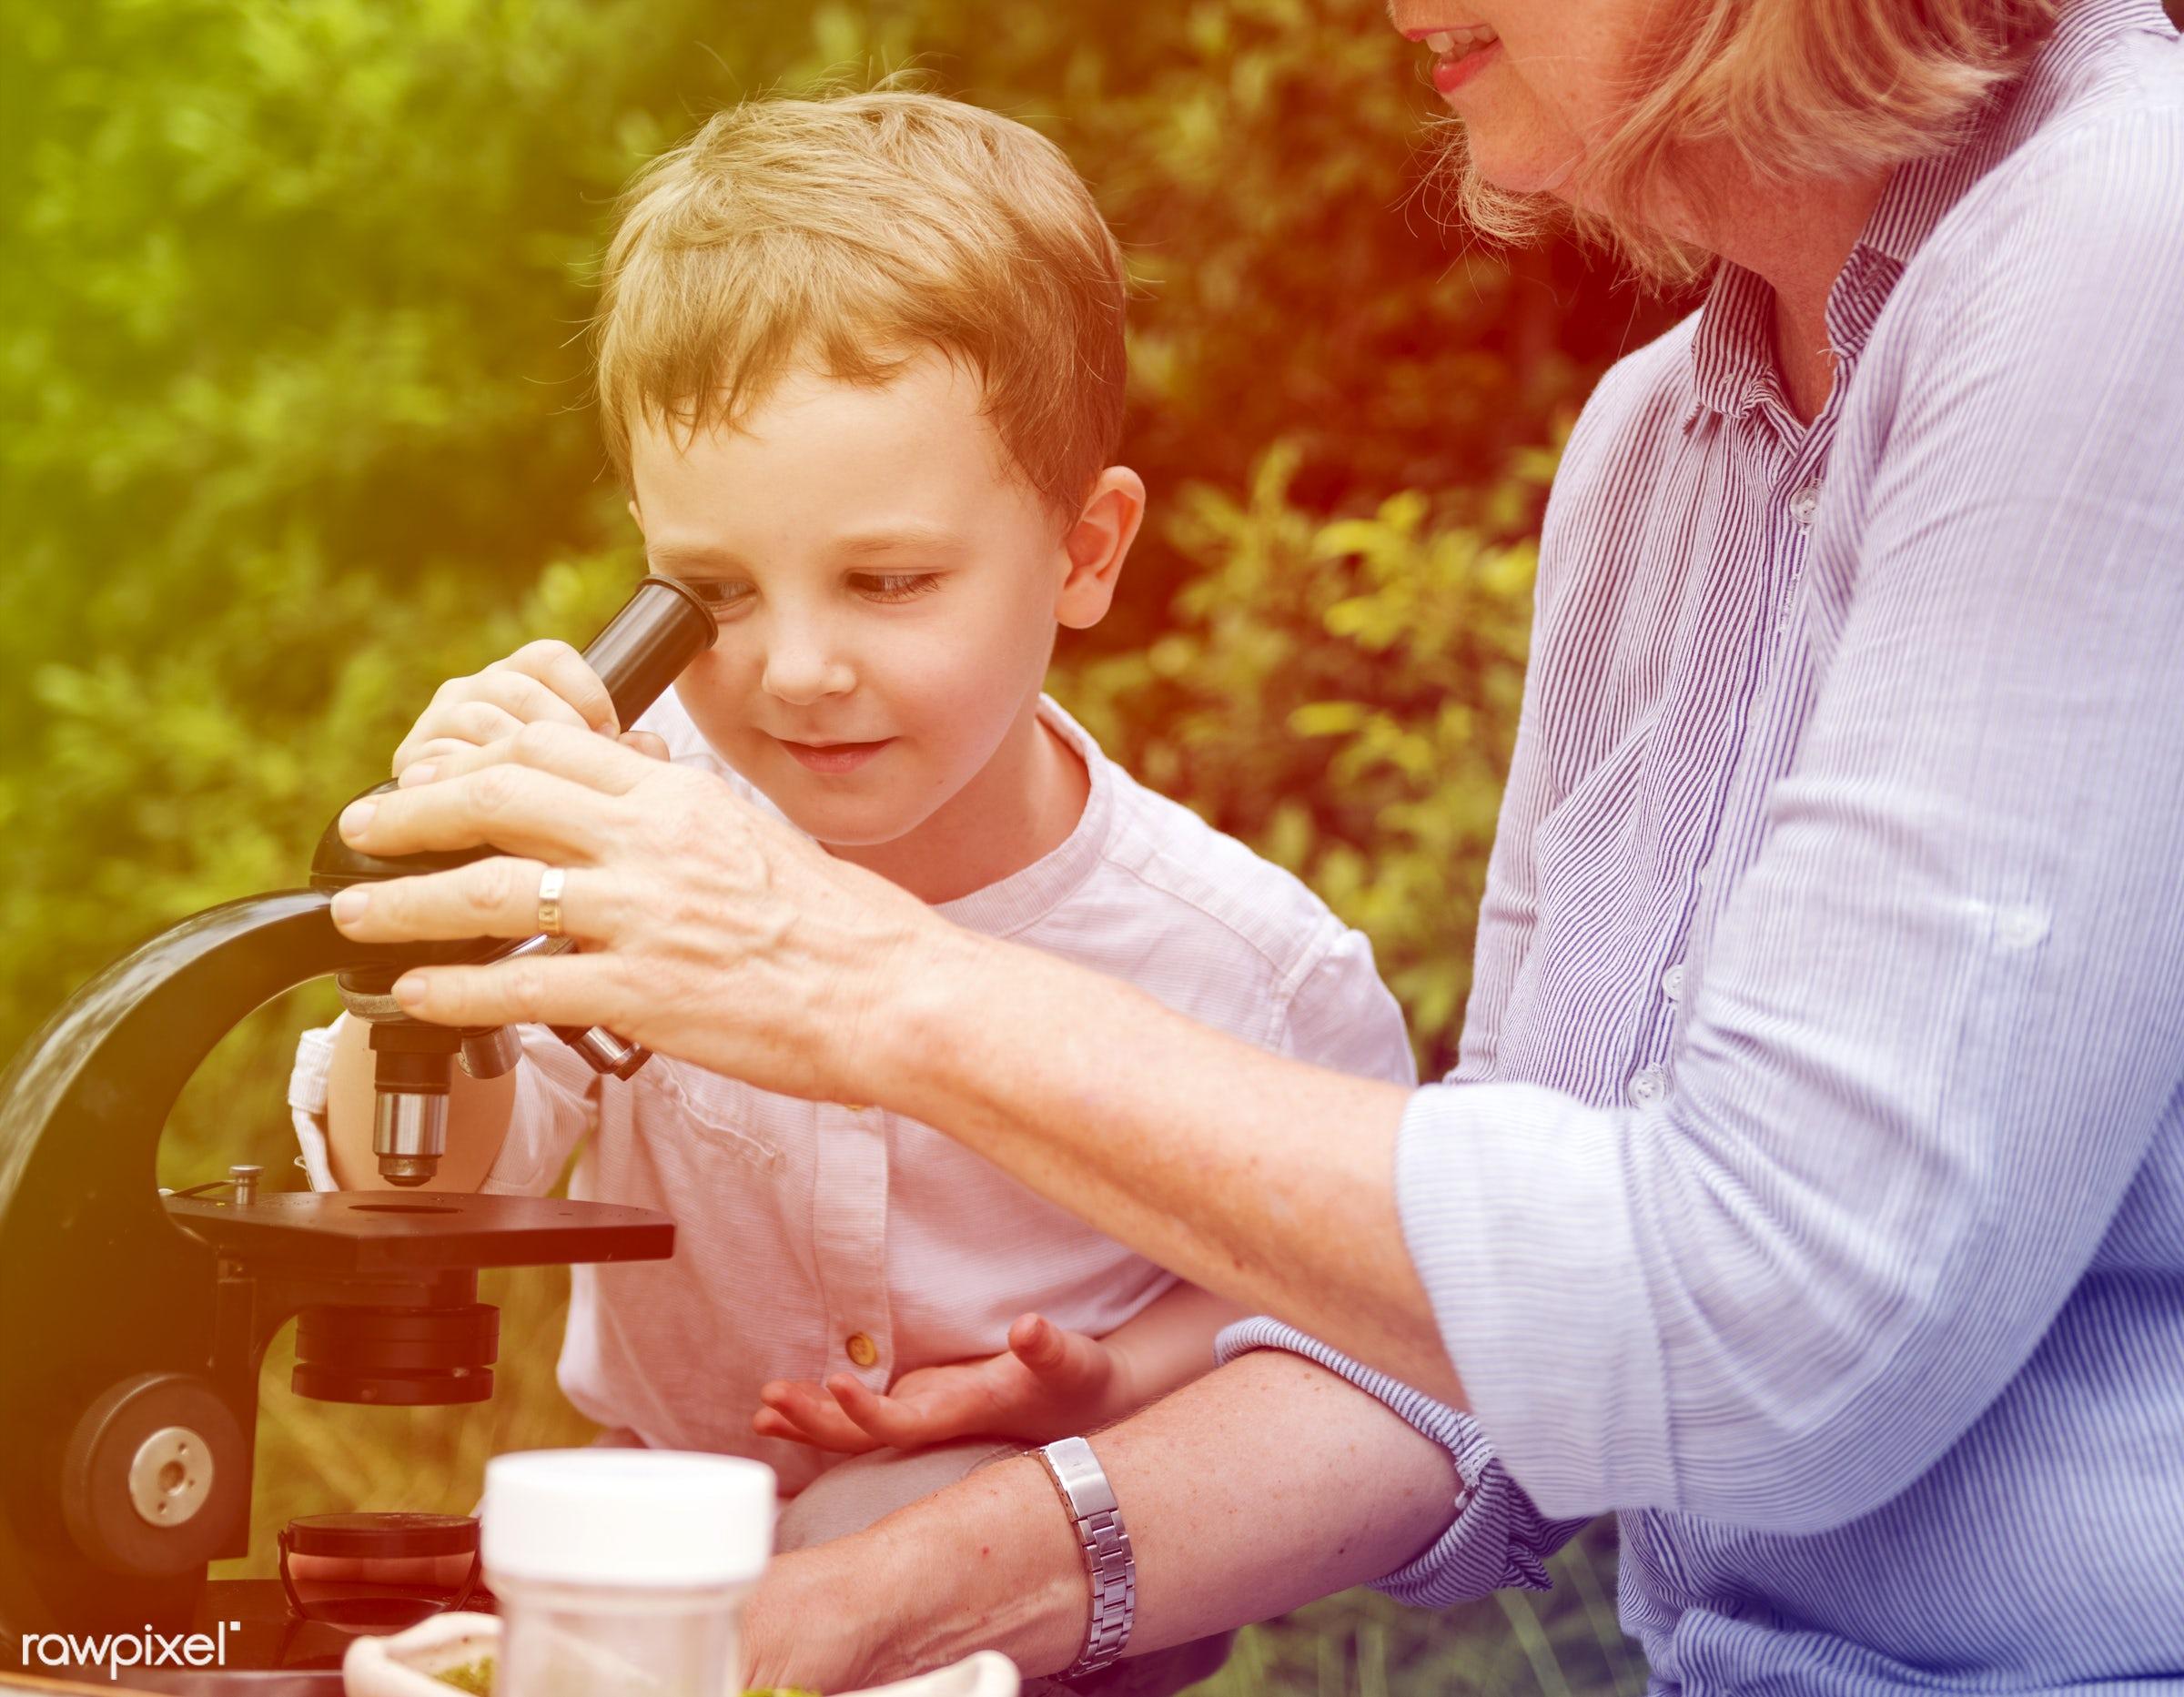 plant, positivity, science, microscope, kid, child, life, micro, lomo, lifestyle, experiment, pottery, smile, positive,...